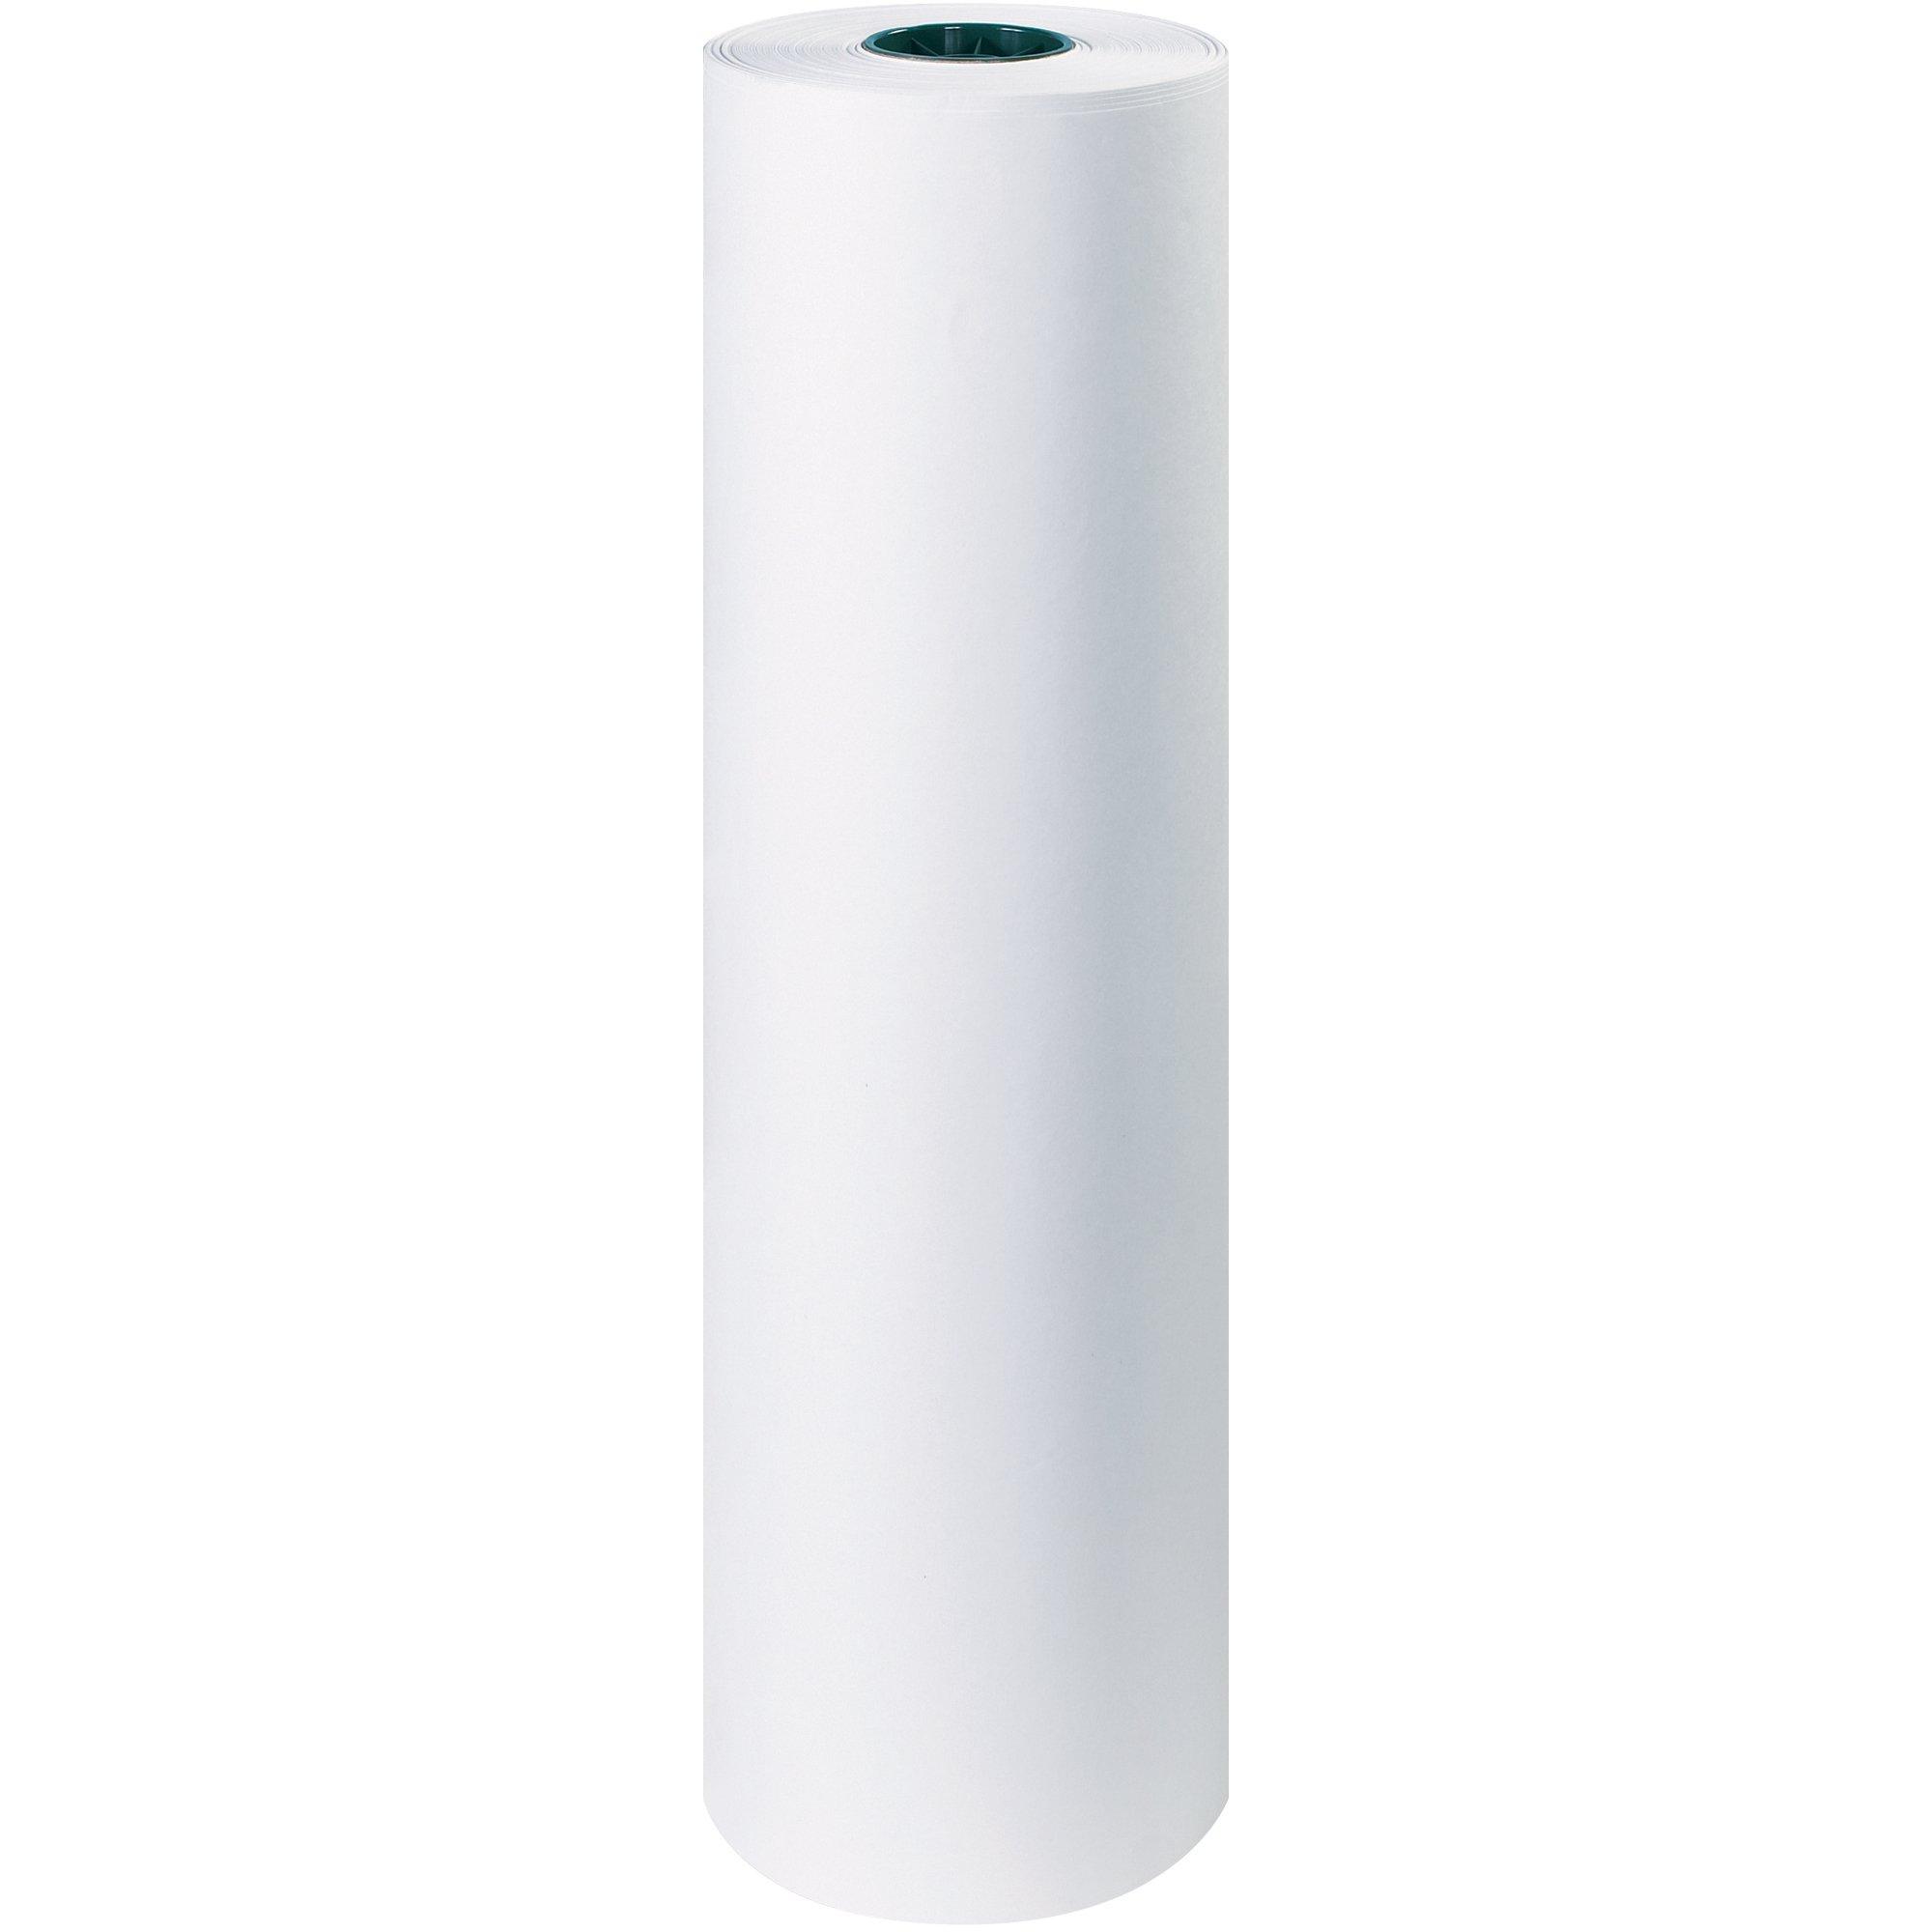 Aviditi Butcher Paper Roll, 1000' L x 30'' W, White (BP3040W)